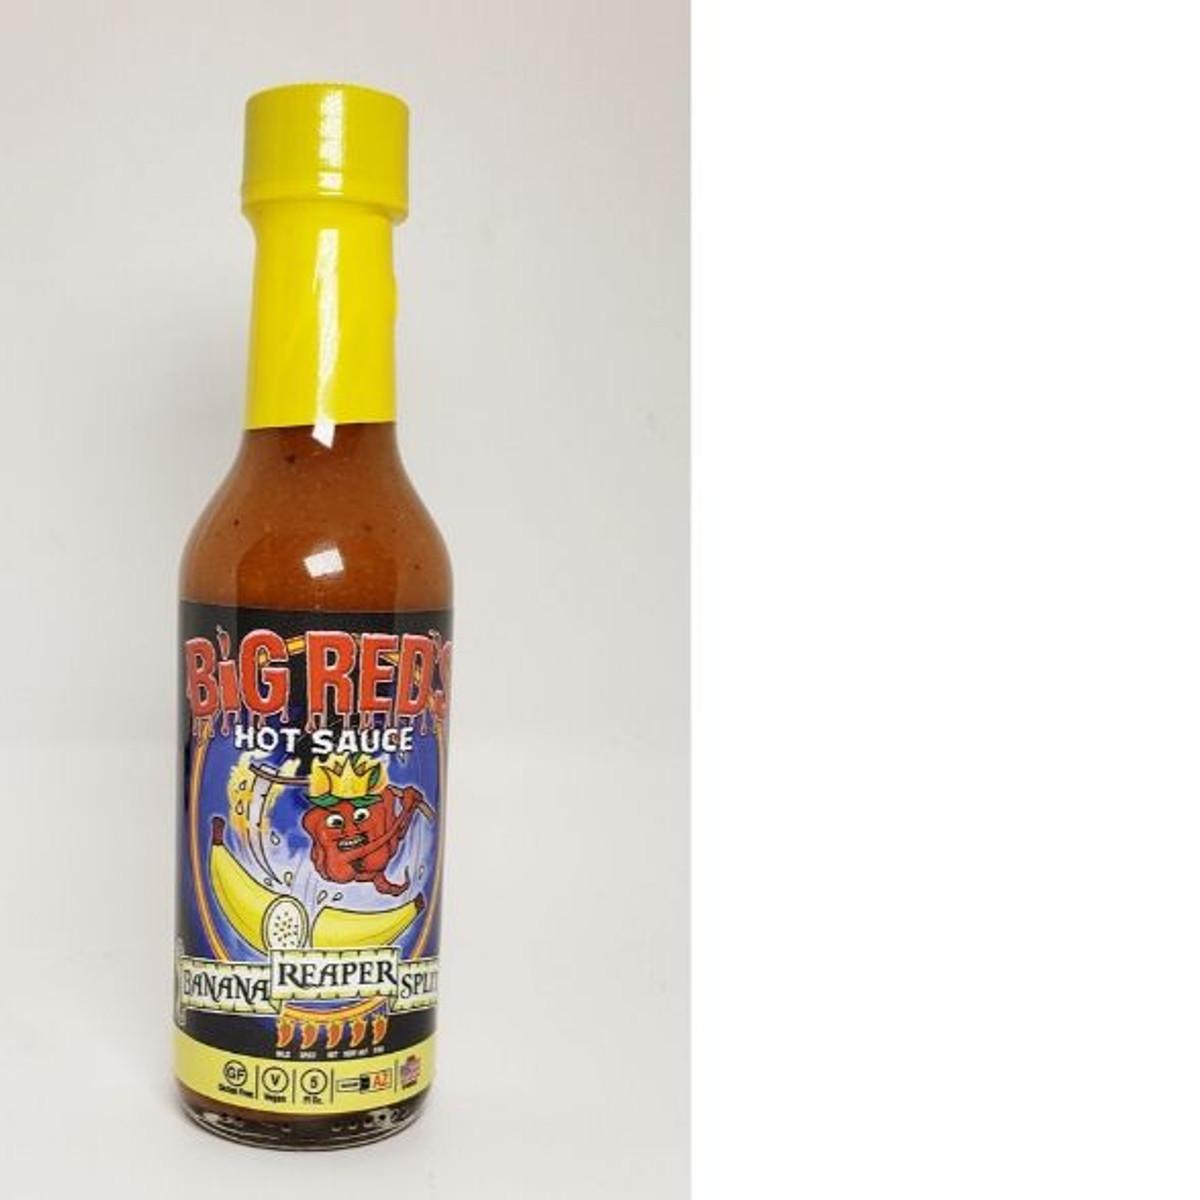 Big Red's Banana Reaper Split Hot Sauce